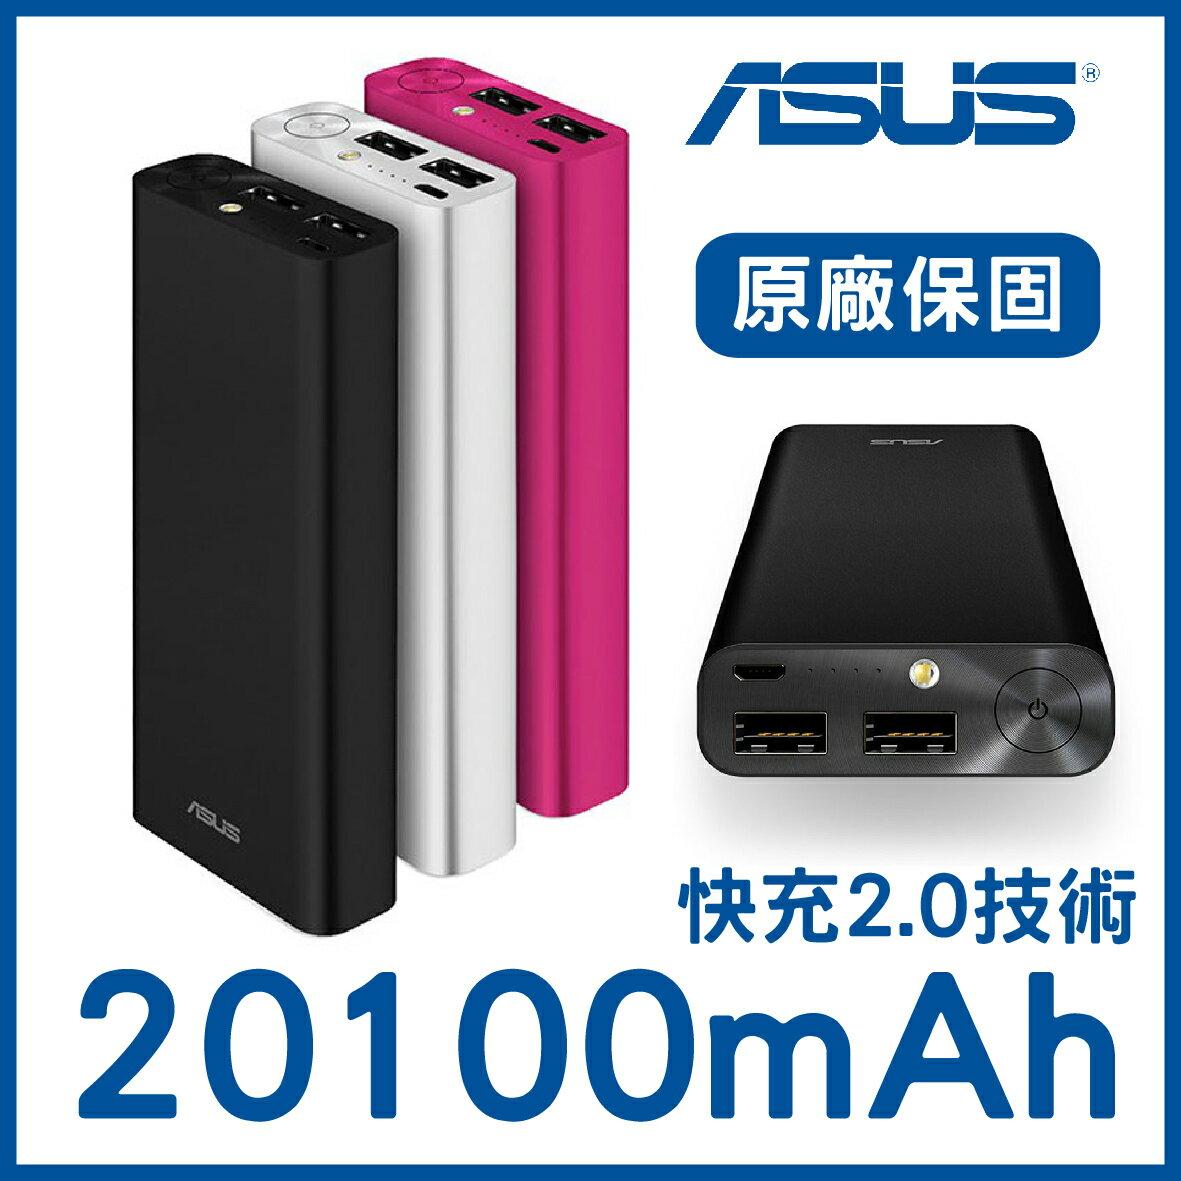 ASUS Zenpower Ultra 20100mAh 行動電源 手電筒 雙輸出 快速充電 華碩